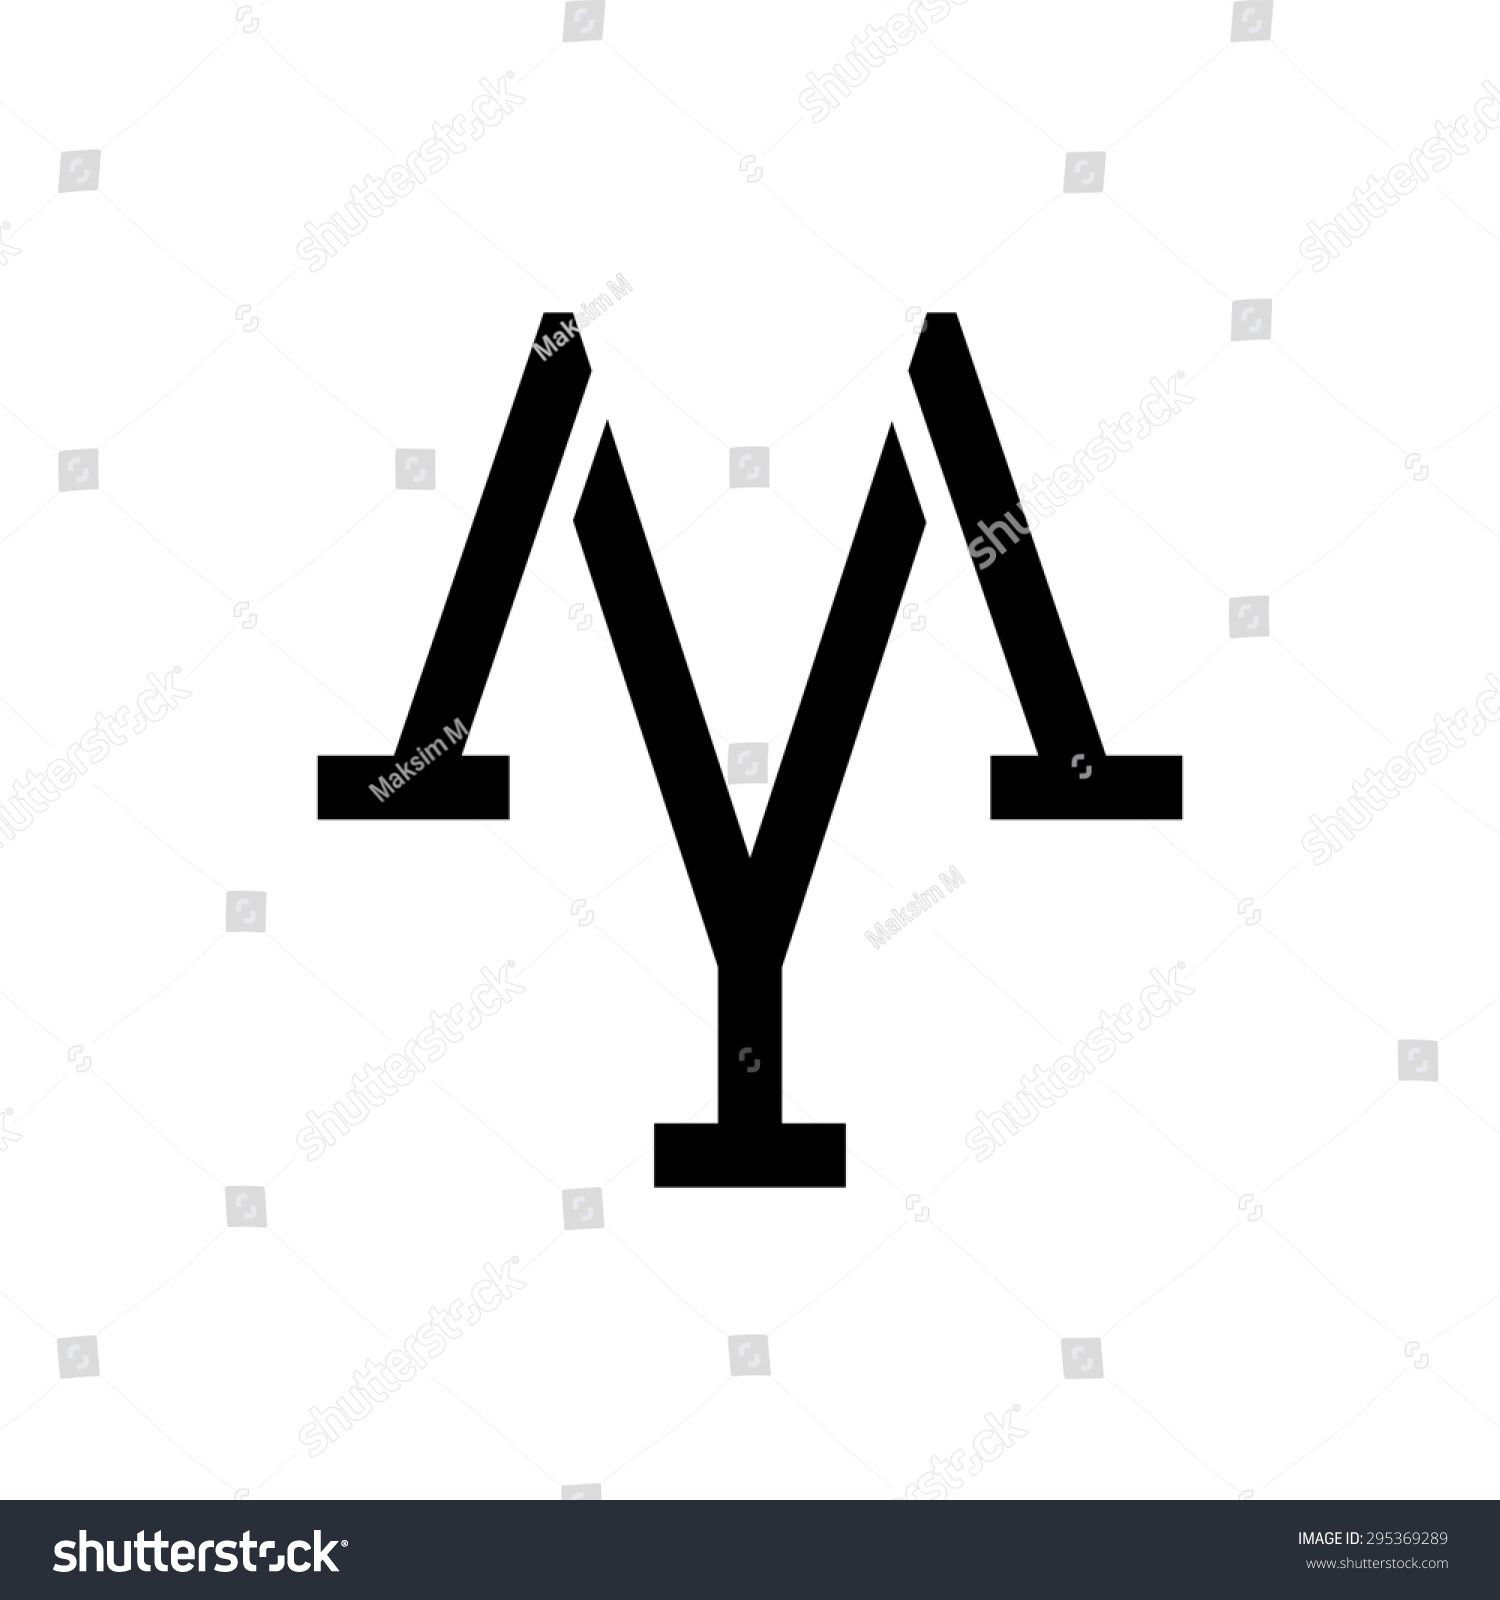 letter m y logo template monogramのイラスト素材 295369289 shutterstock